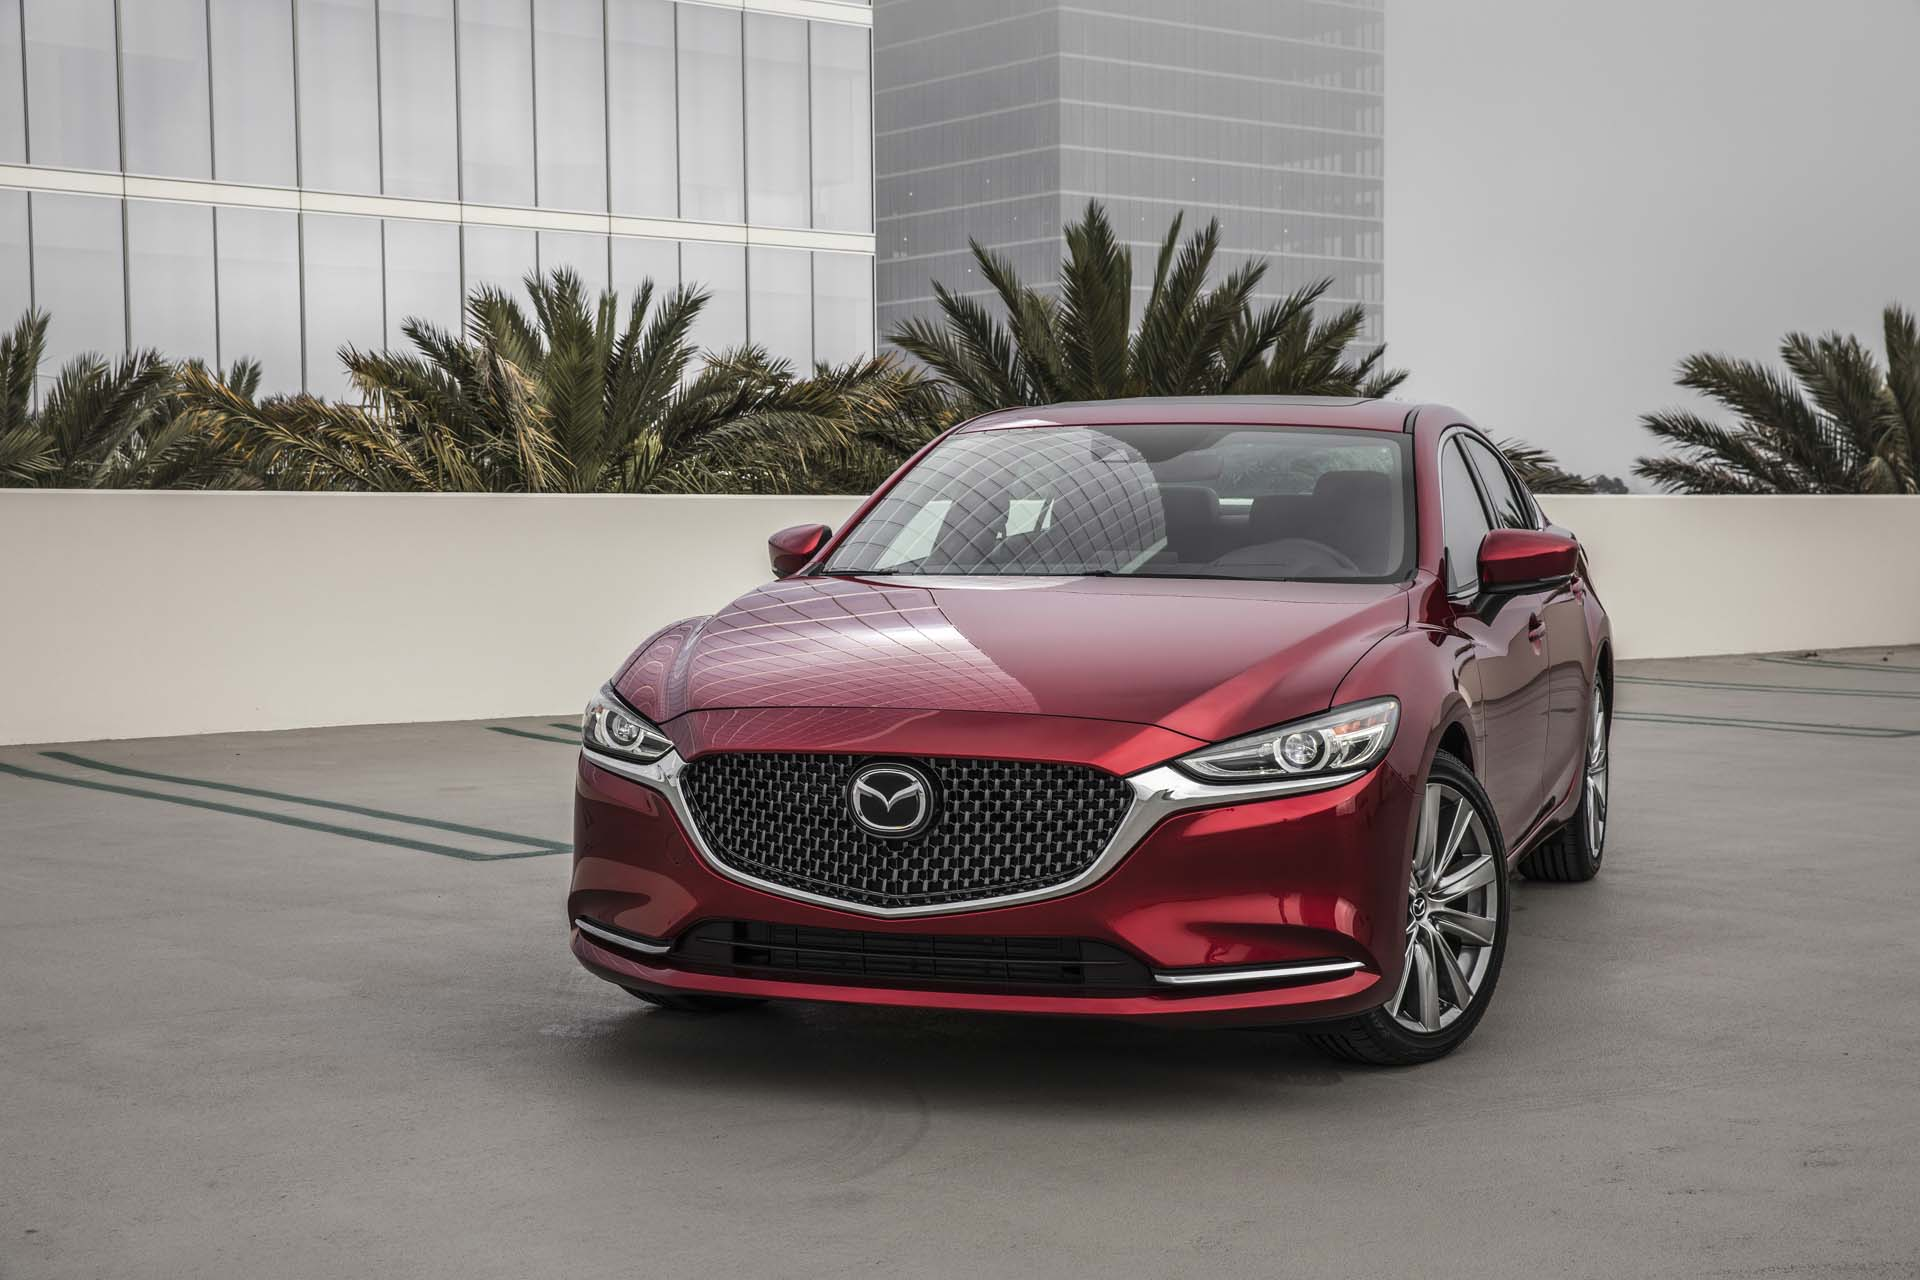 Kelebihan Kekurangan Mazda Cx6 Murah Berkualitas